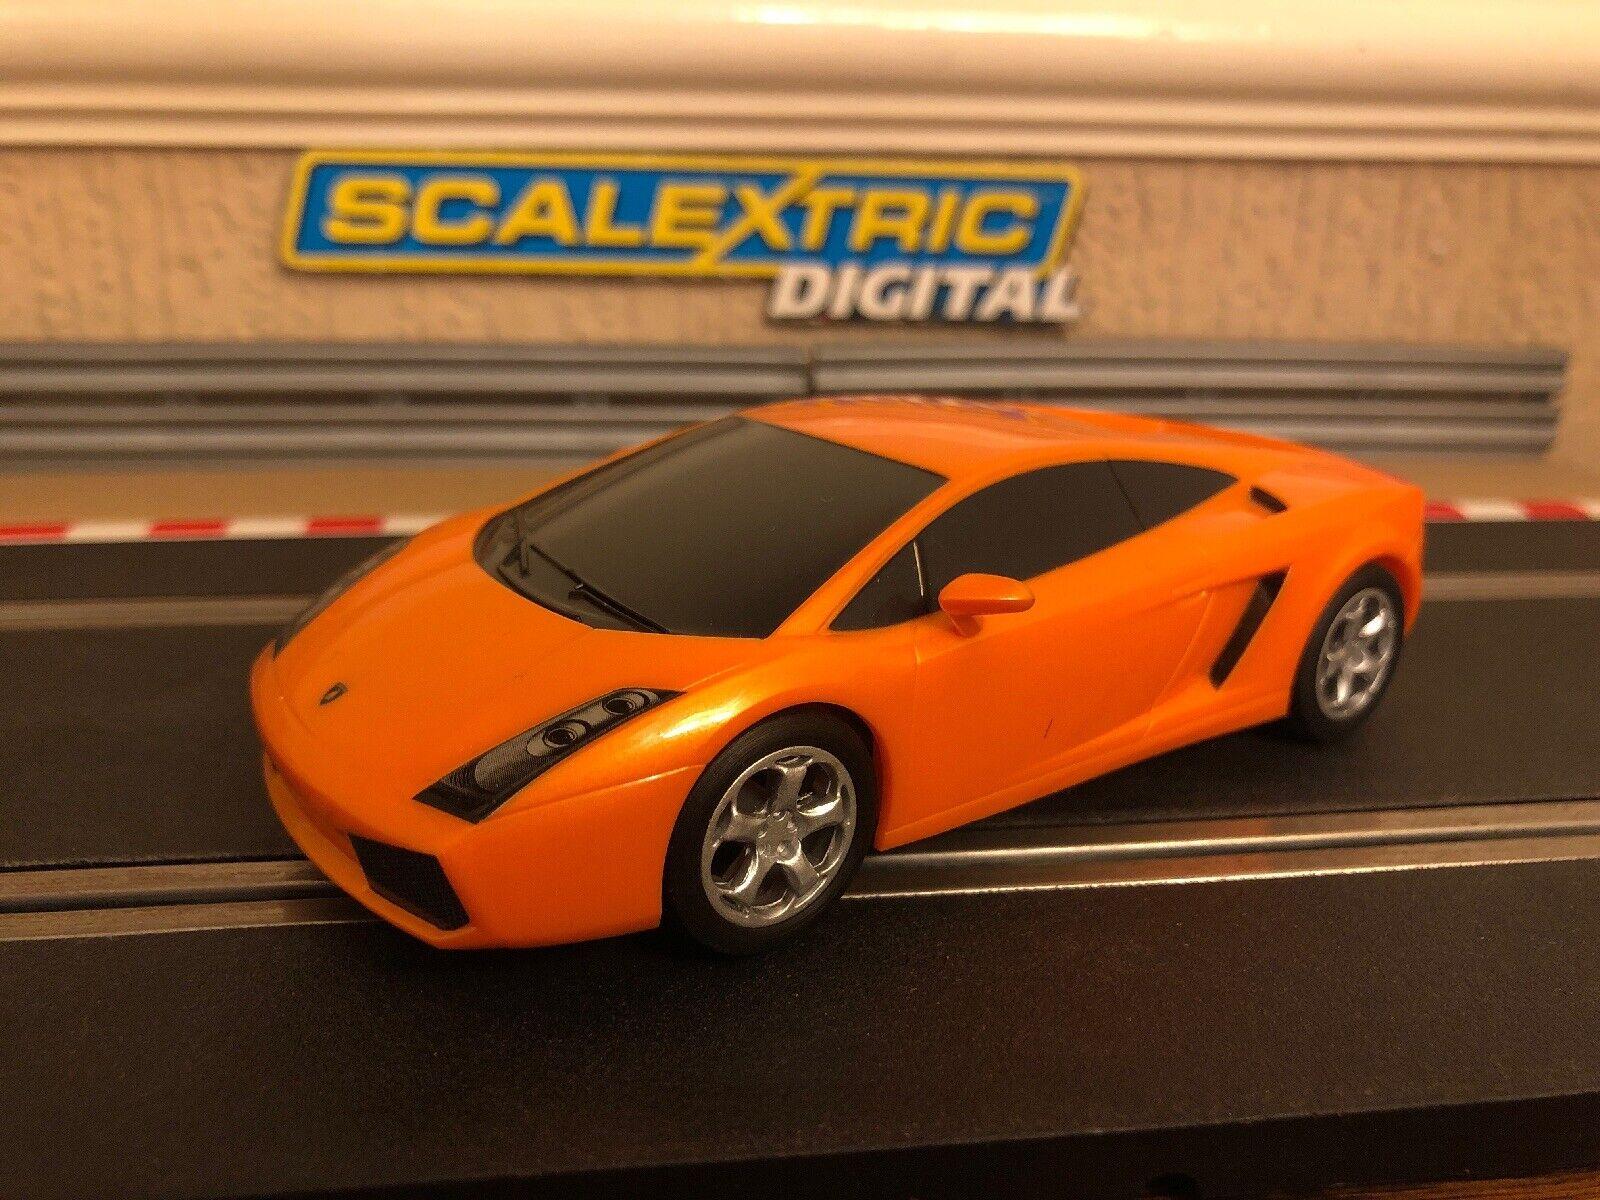 Scalextric Digital Lamborghini Gallardo Fully Serviced & In Mint Condition